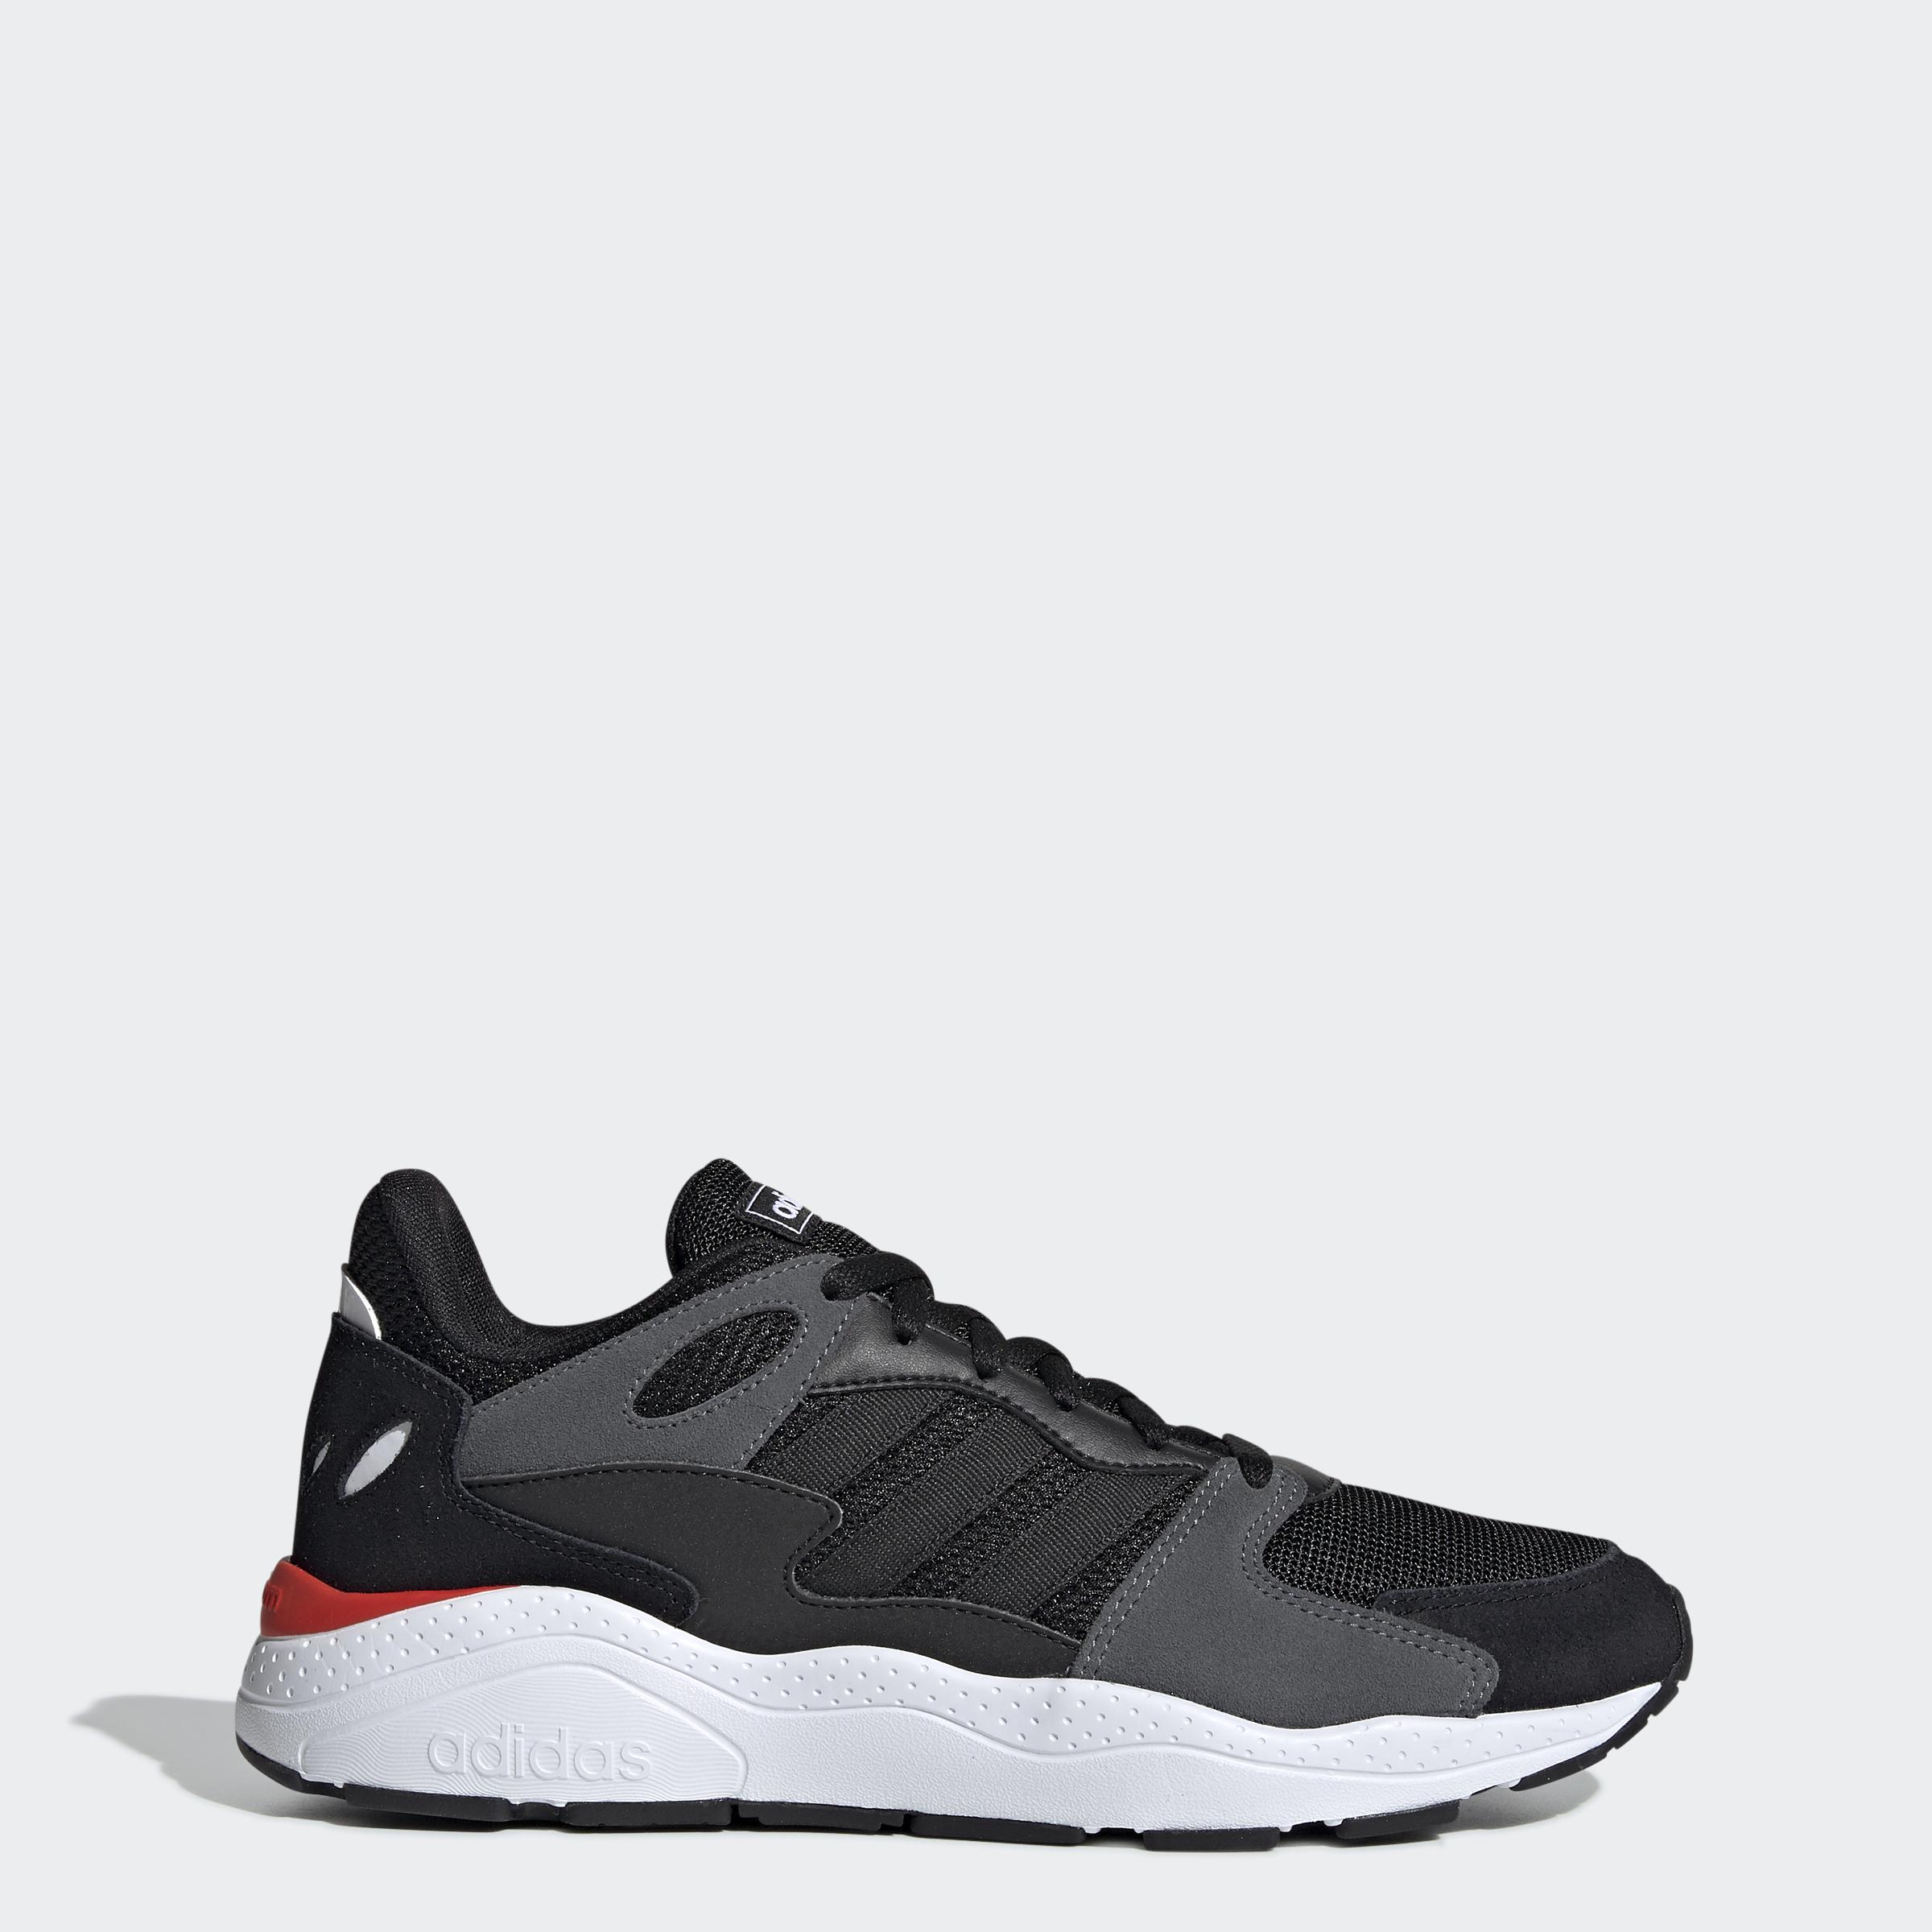 adidas Crazychaos Mens Chaos Sneakers